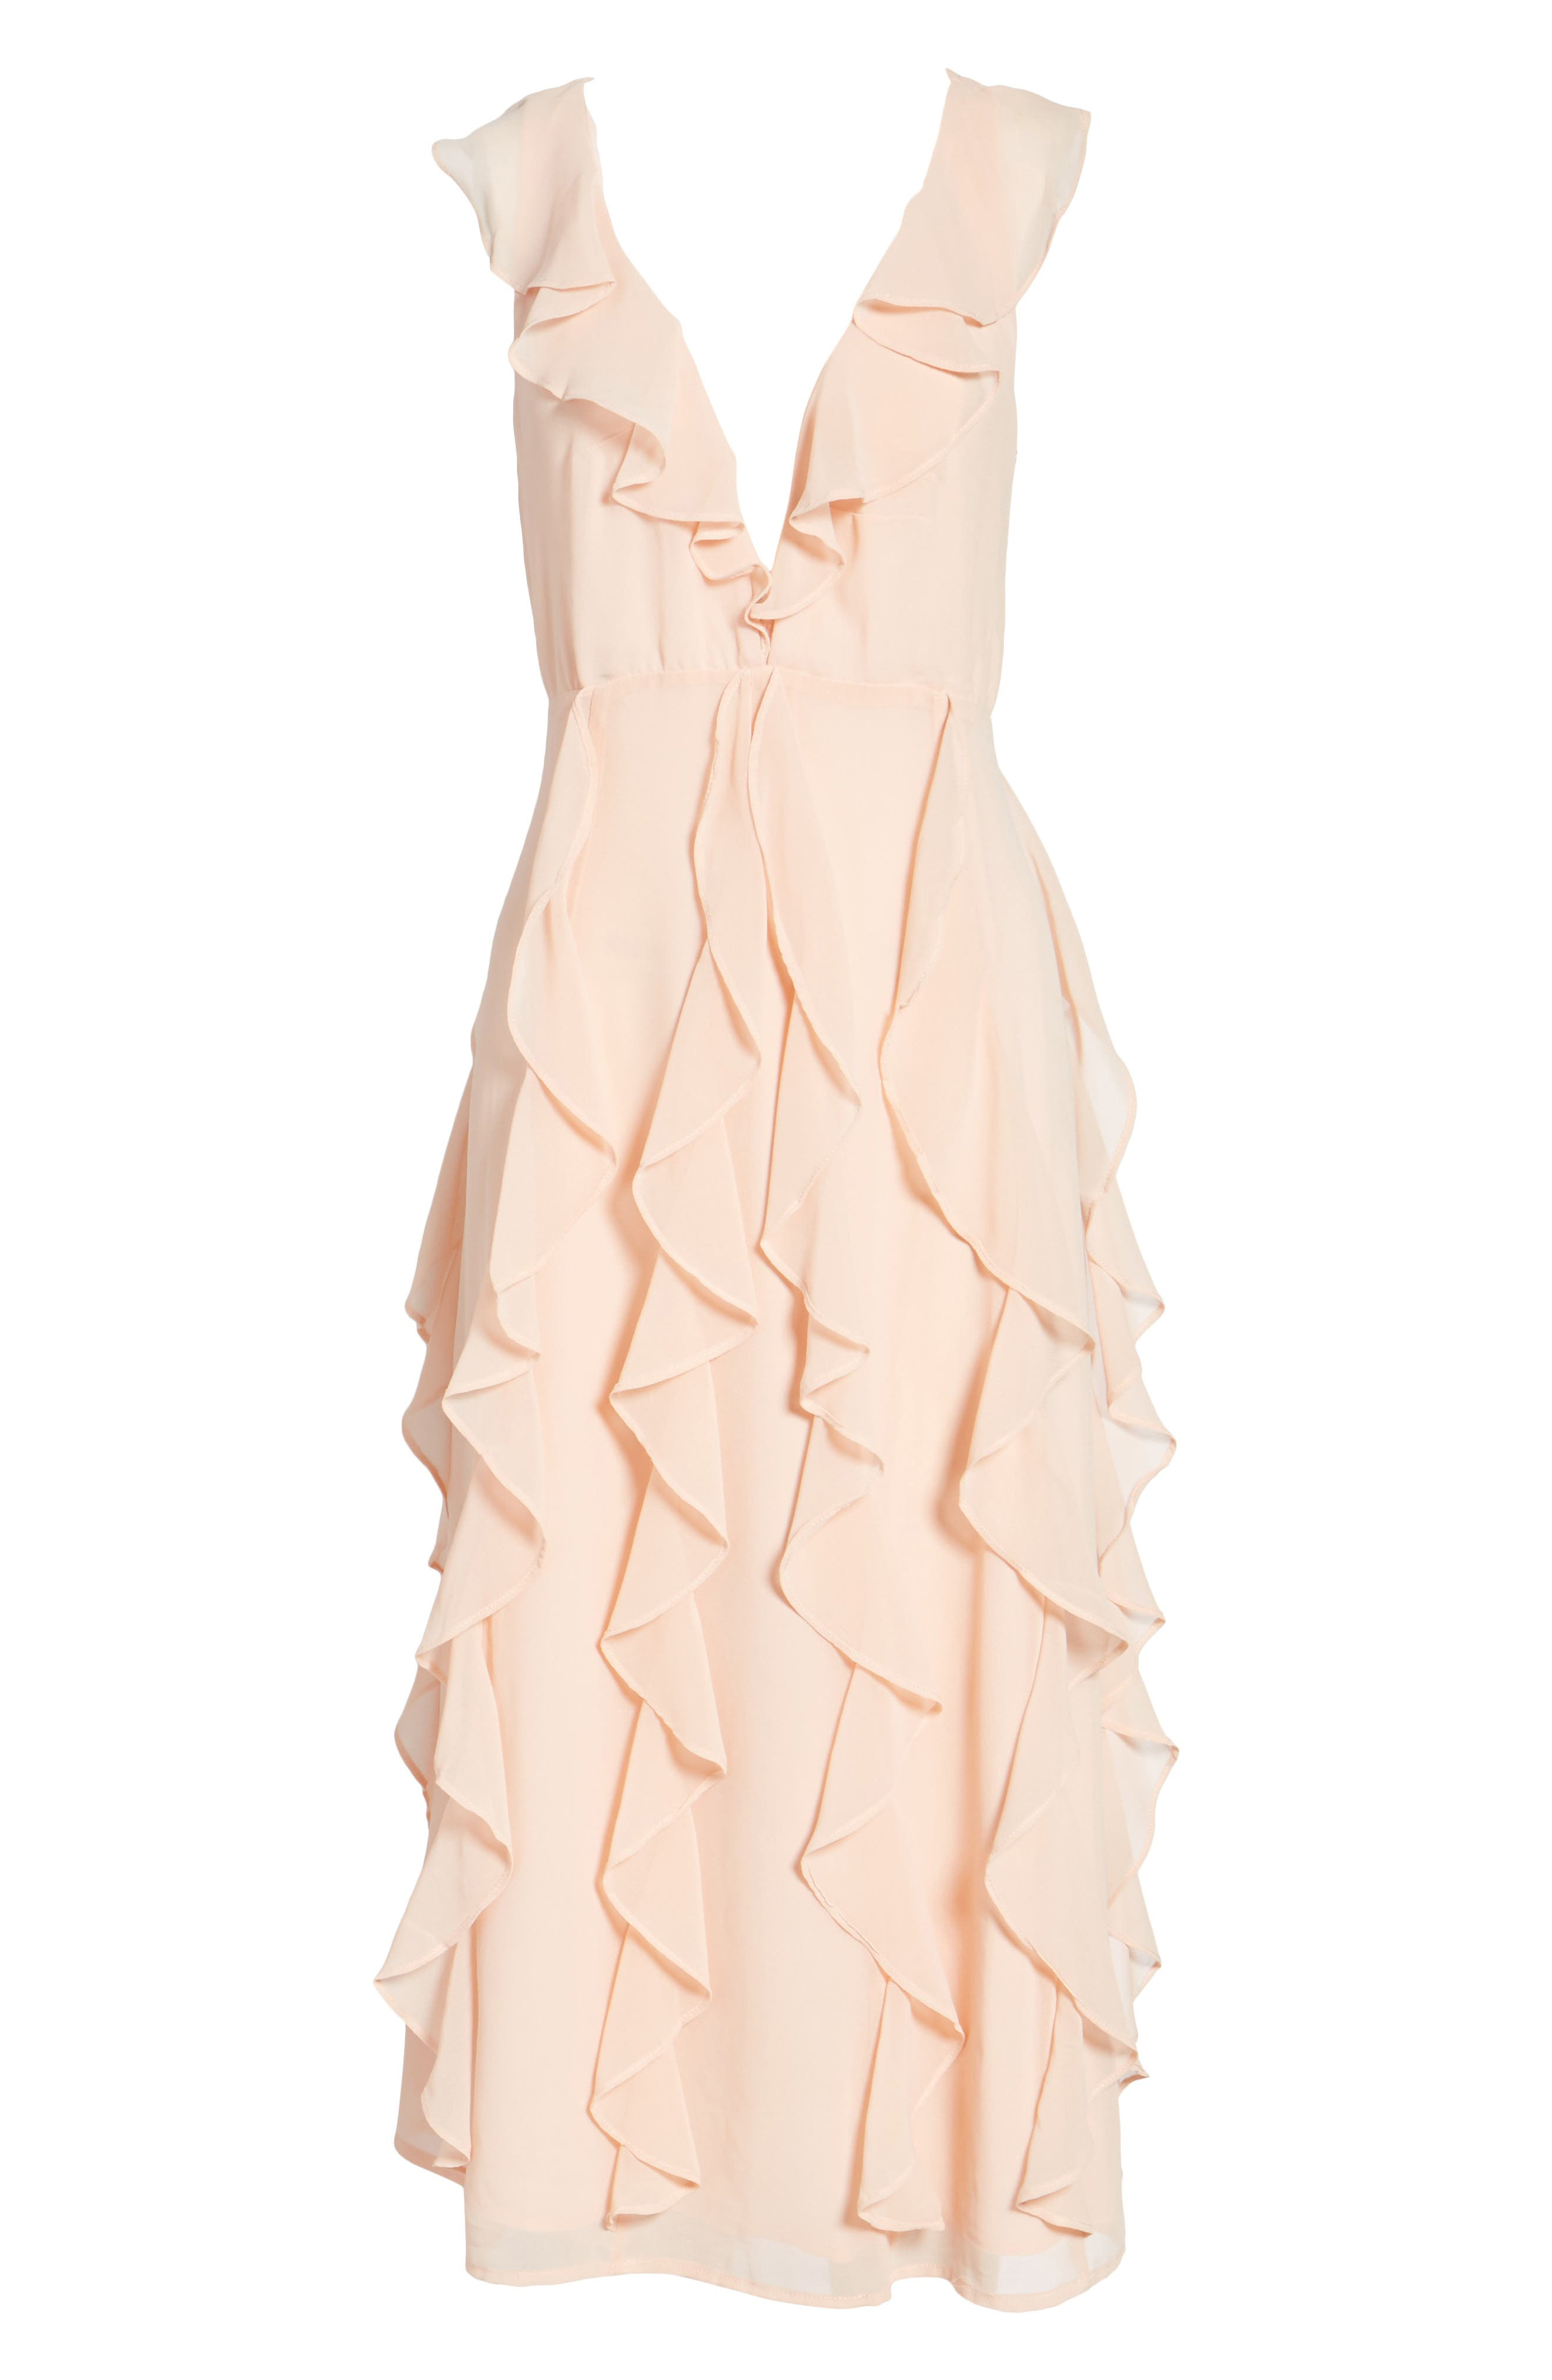 Ingrid Ruffle Chiffon Midi Dress,                             Alternate thumbnail 6, color,                             Cameo Rose